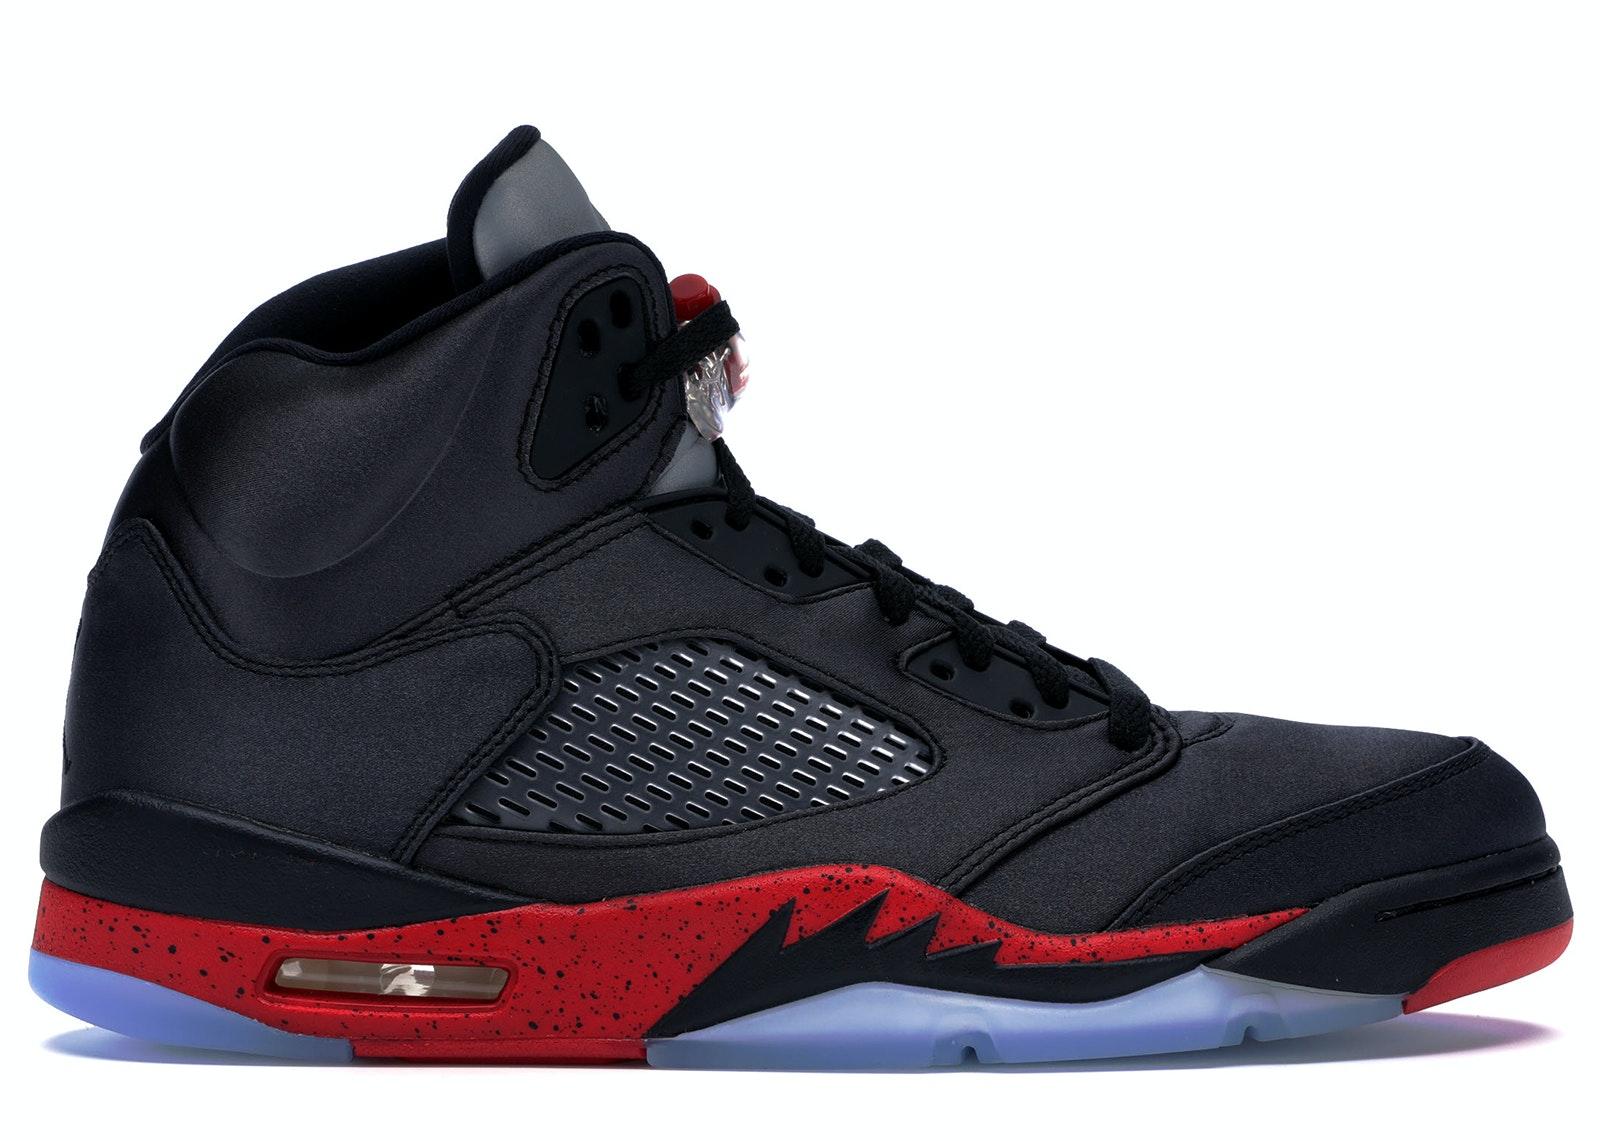 Jordan 5 Retro Satin Bred